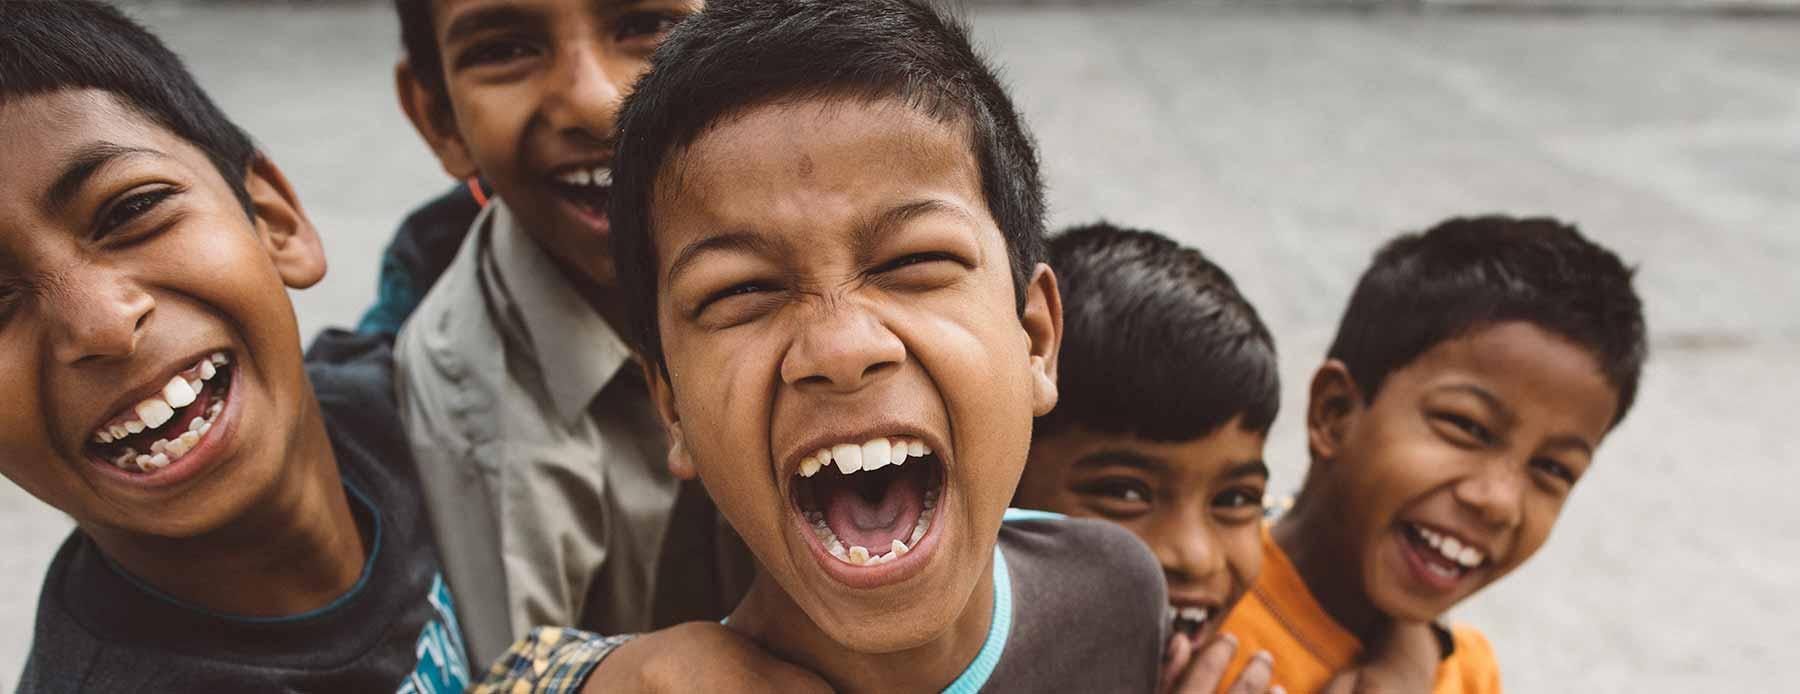 gsam-kids-laughing